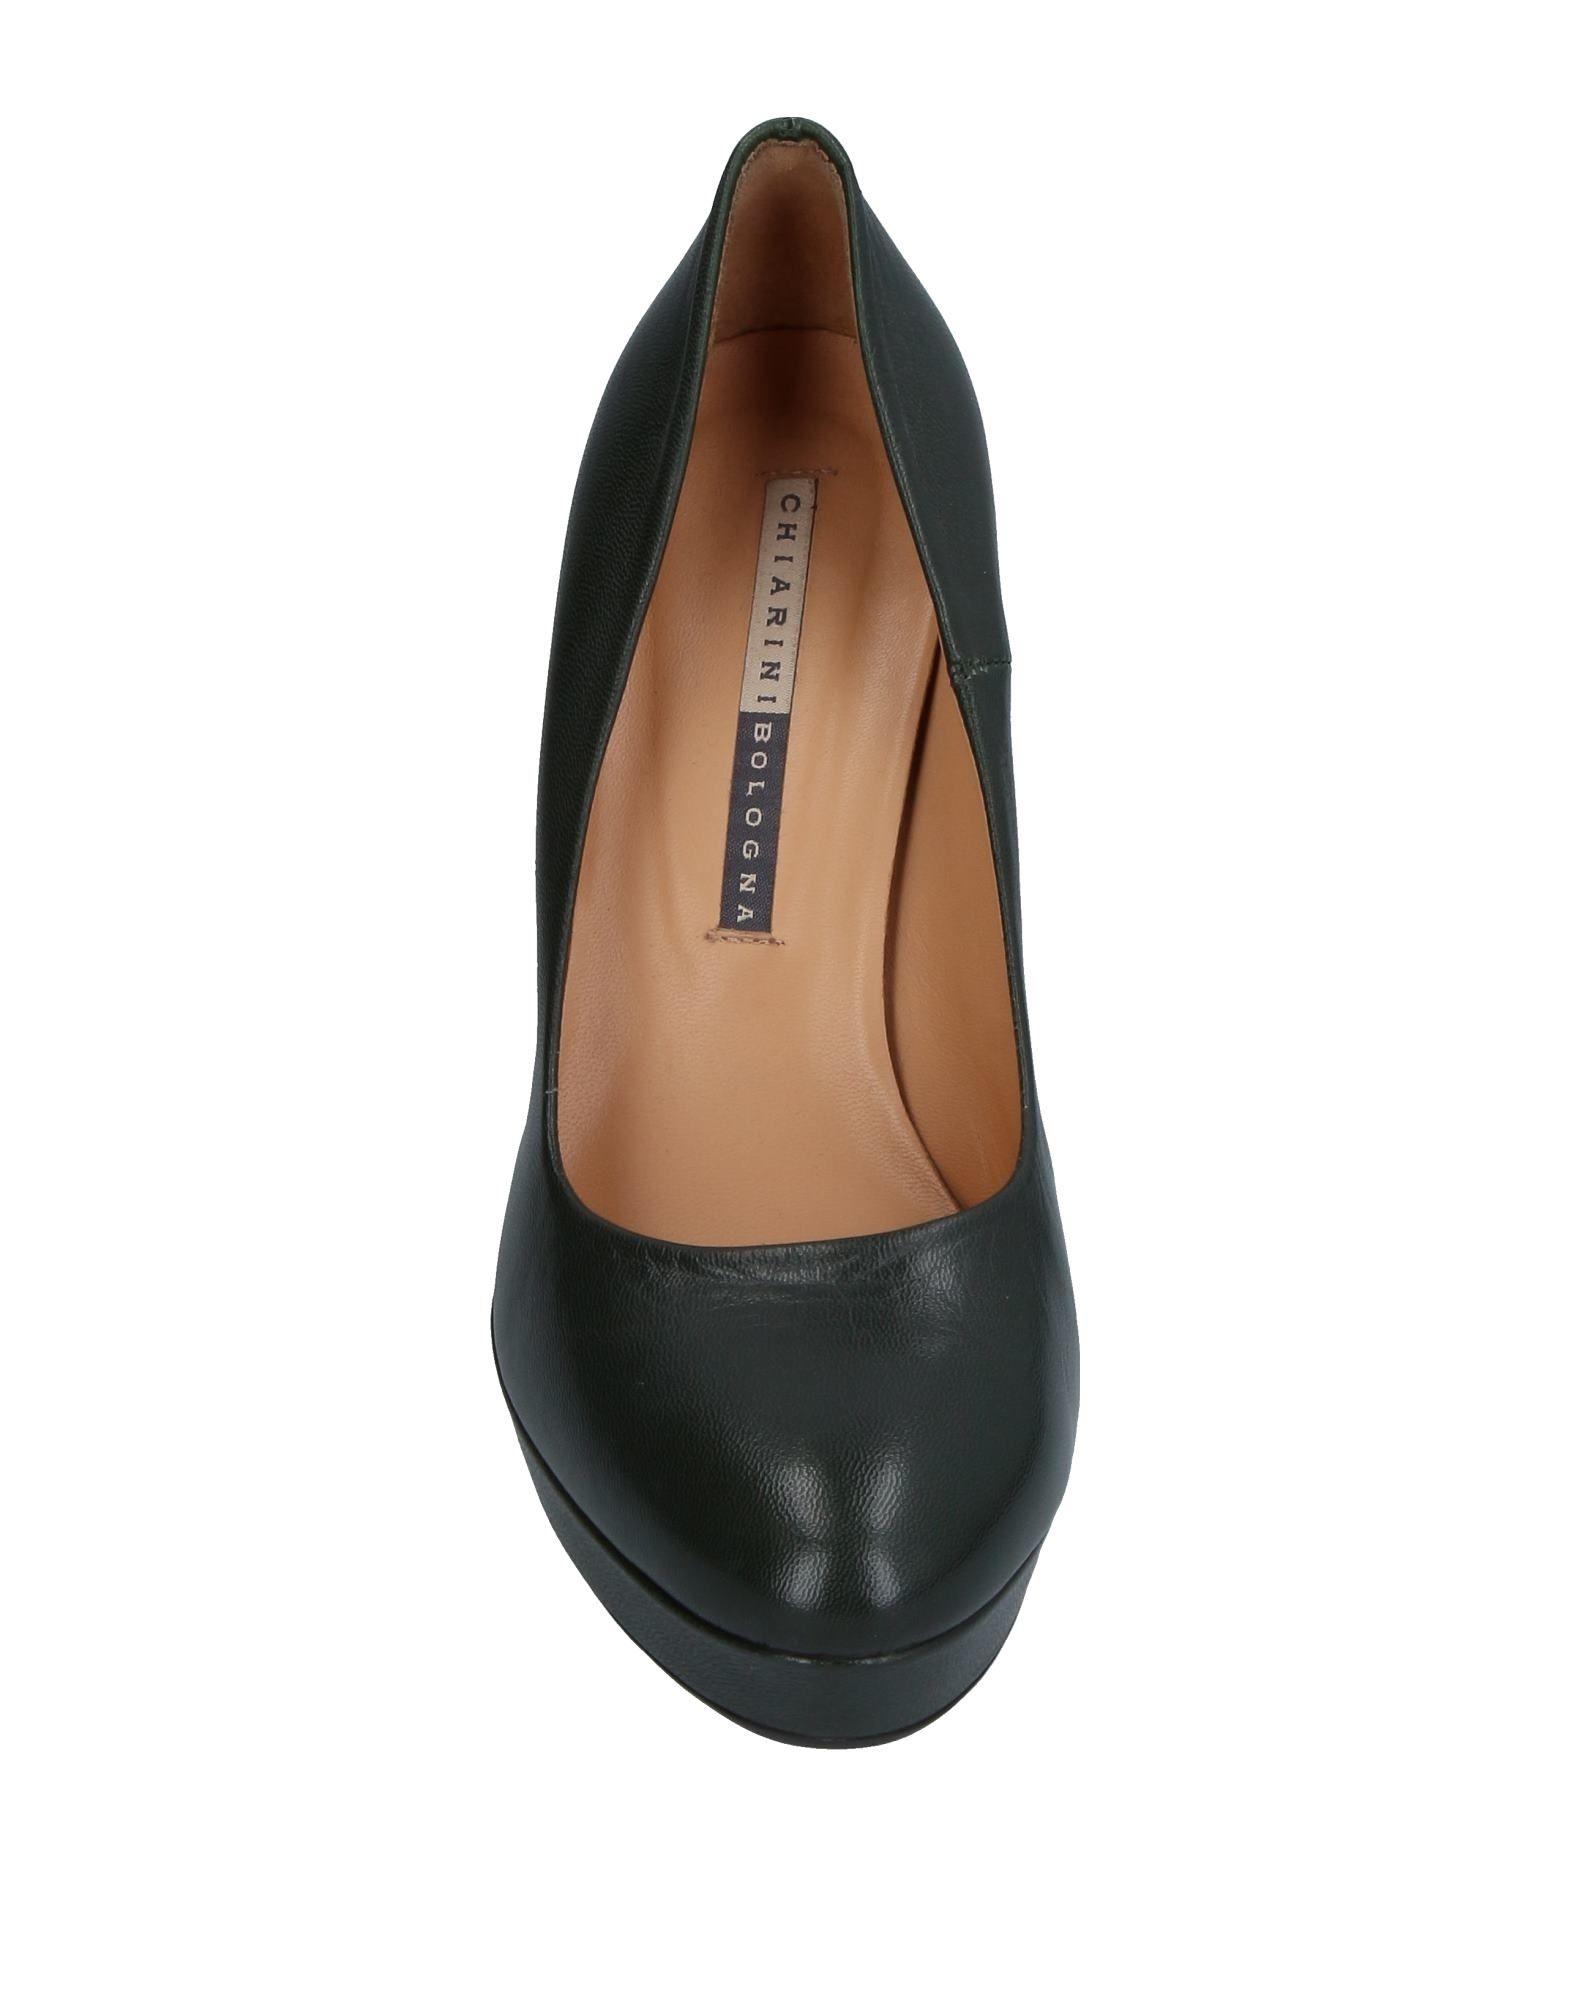 Chiarini Bologna Pumps Damen  Schuhe 11271058TA Gute Qualität beliebte Schuhe  3ebcd0